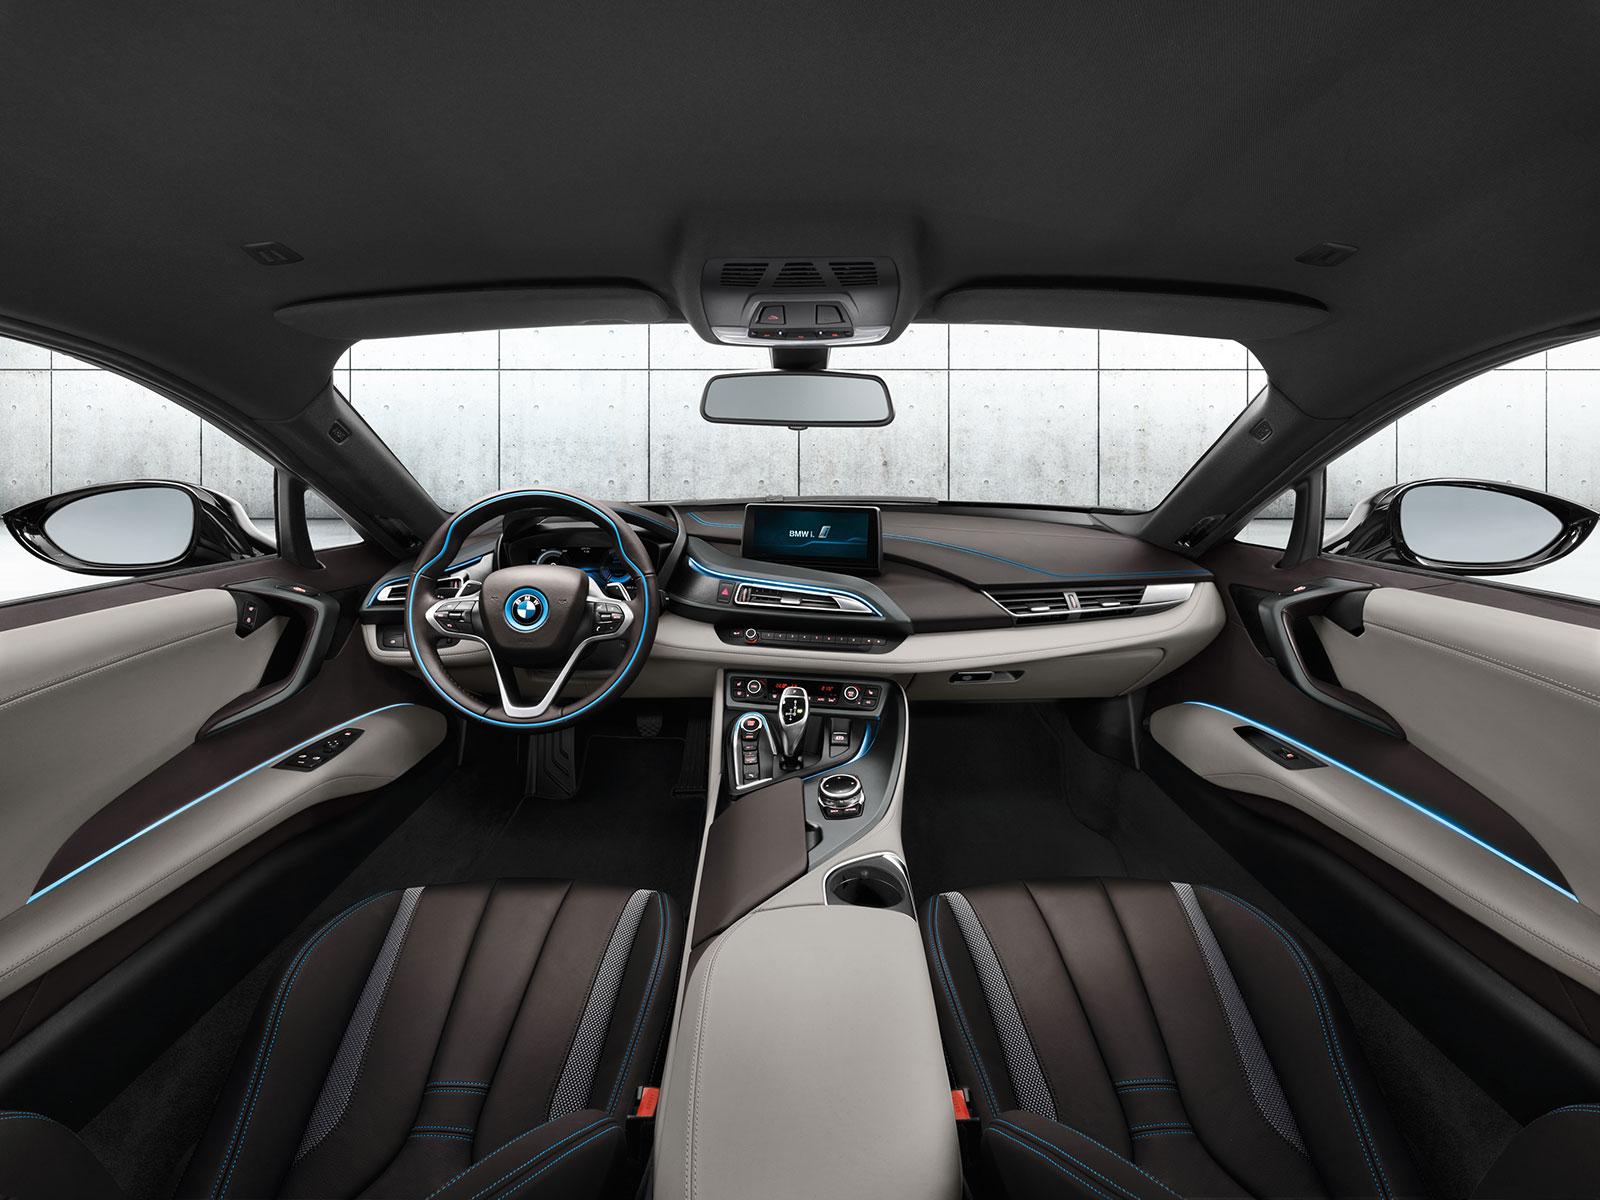 bmw i8 interior car body design. Black Bedroom Furniture Sets. Home Design Ideas